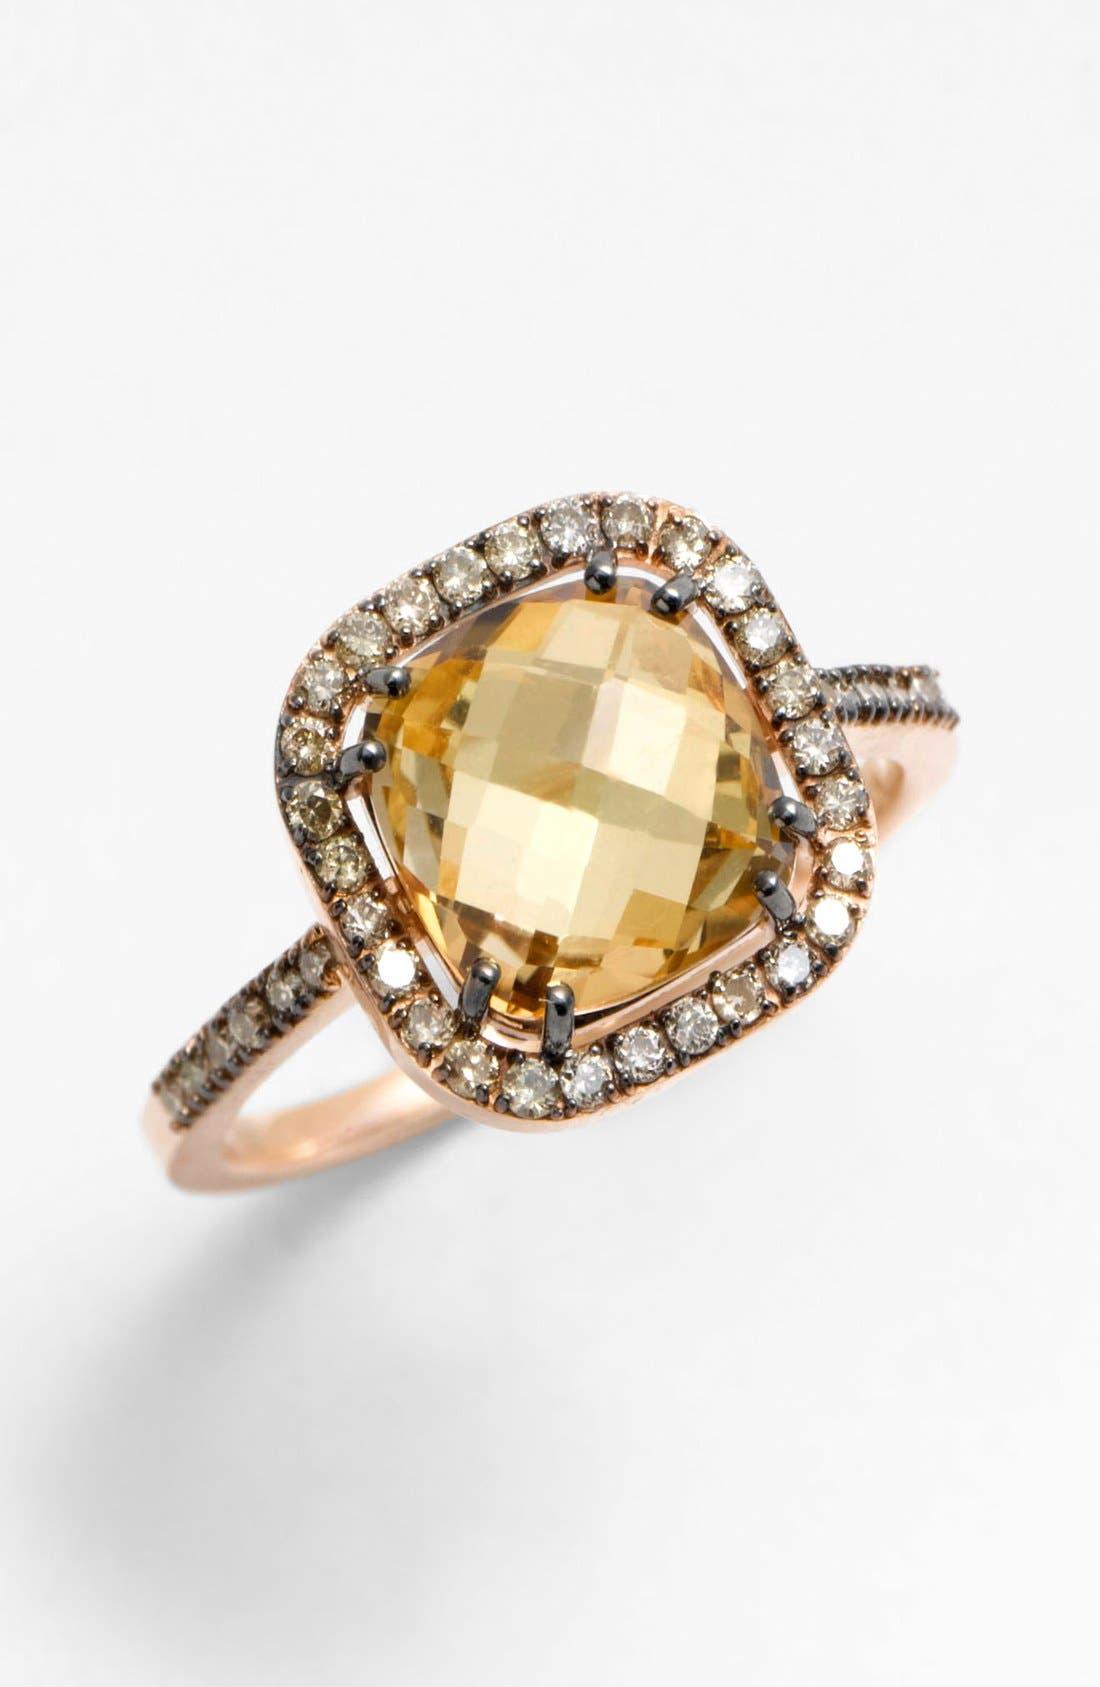 Main Image - KALAN by Suzanne Kalan Cushion Stone Diamond Bezel Ring